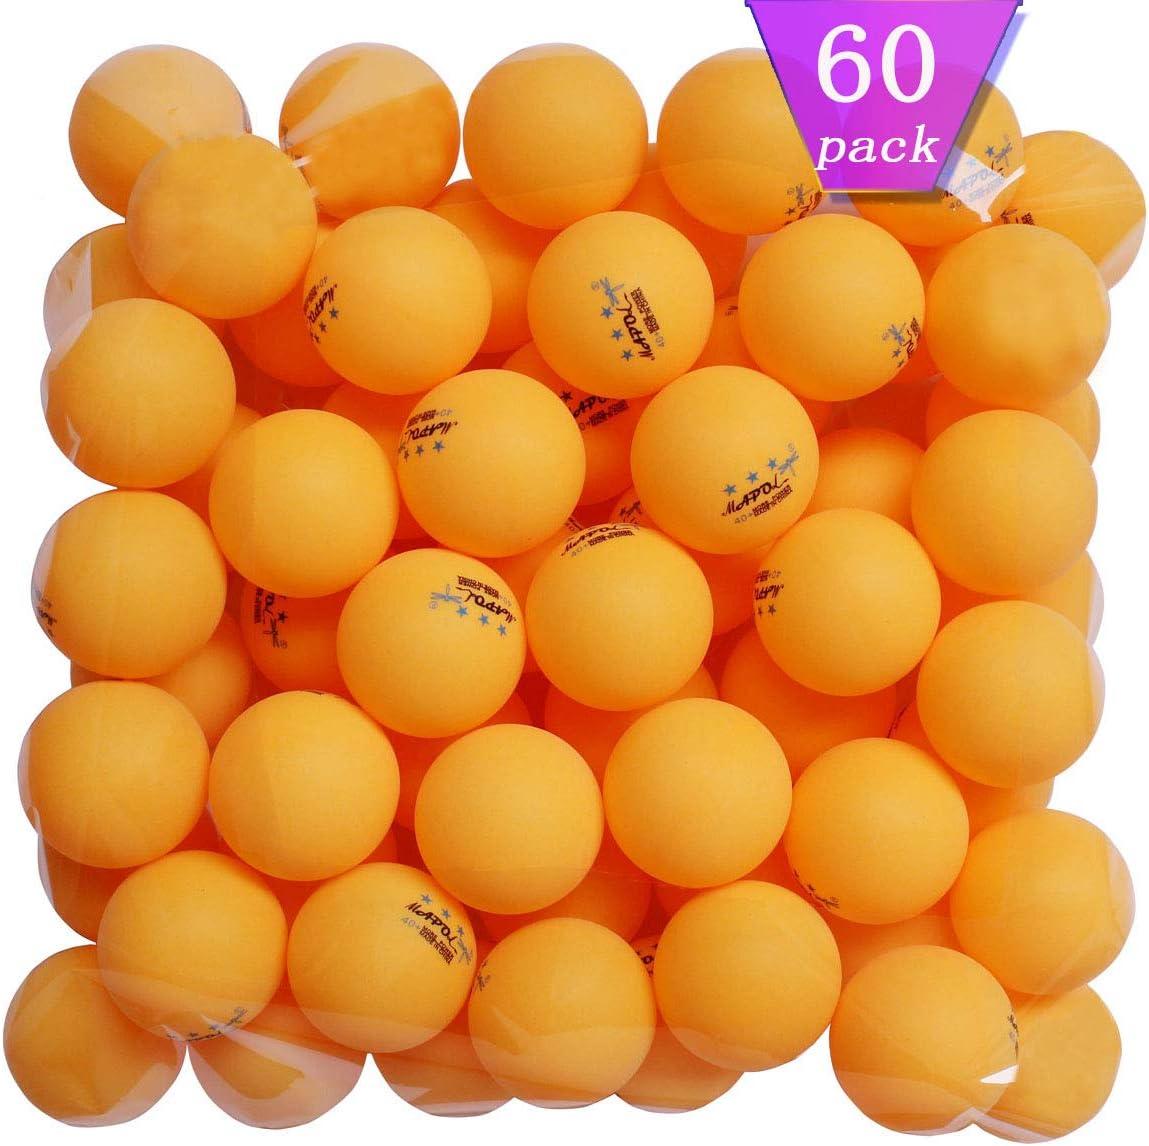 MAPOL 60 Counts 3-Star Orange Ping Pong Balls Advanced Practice Table Tennis Ball